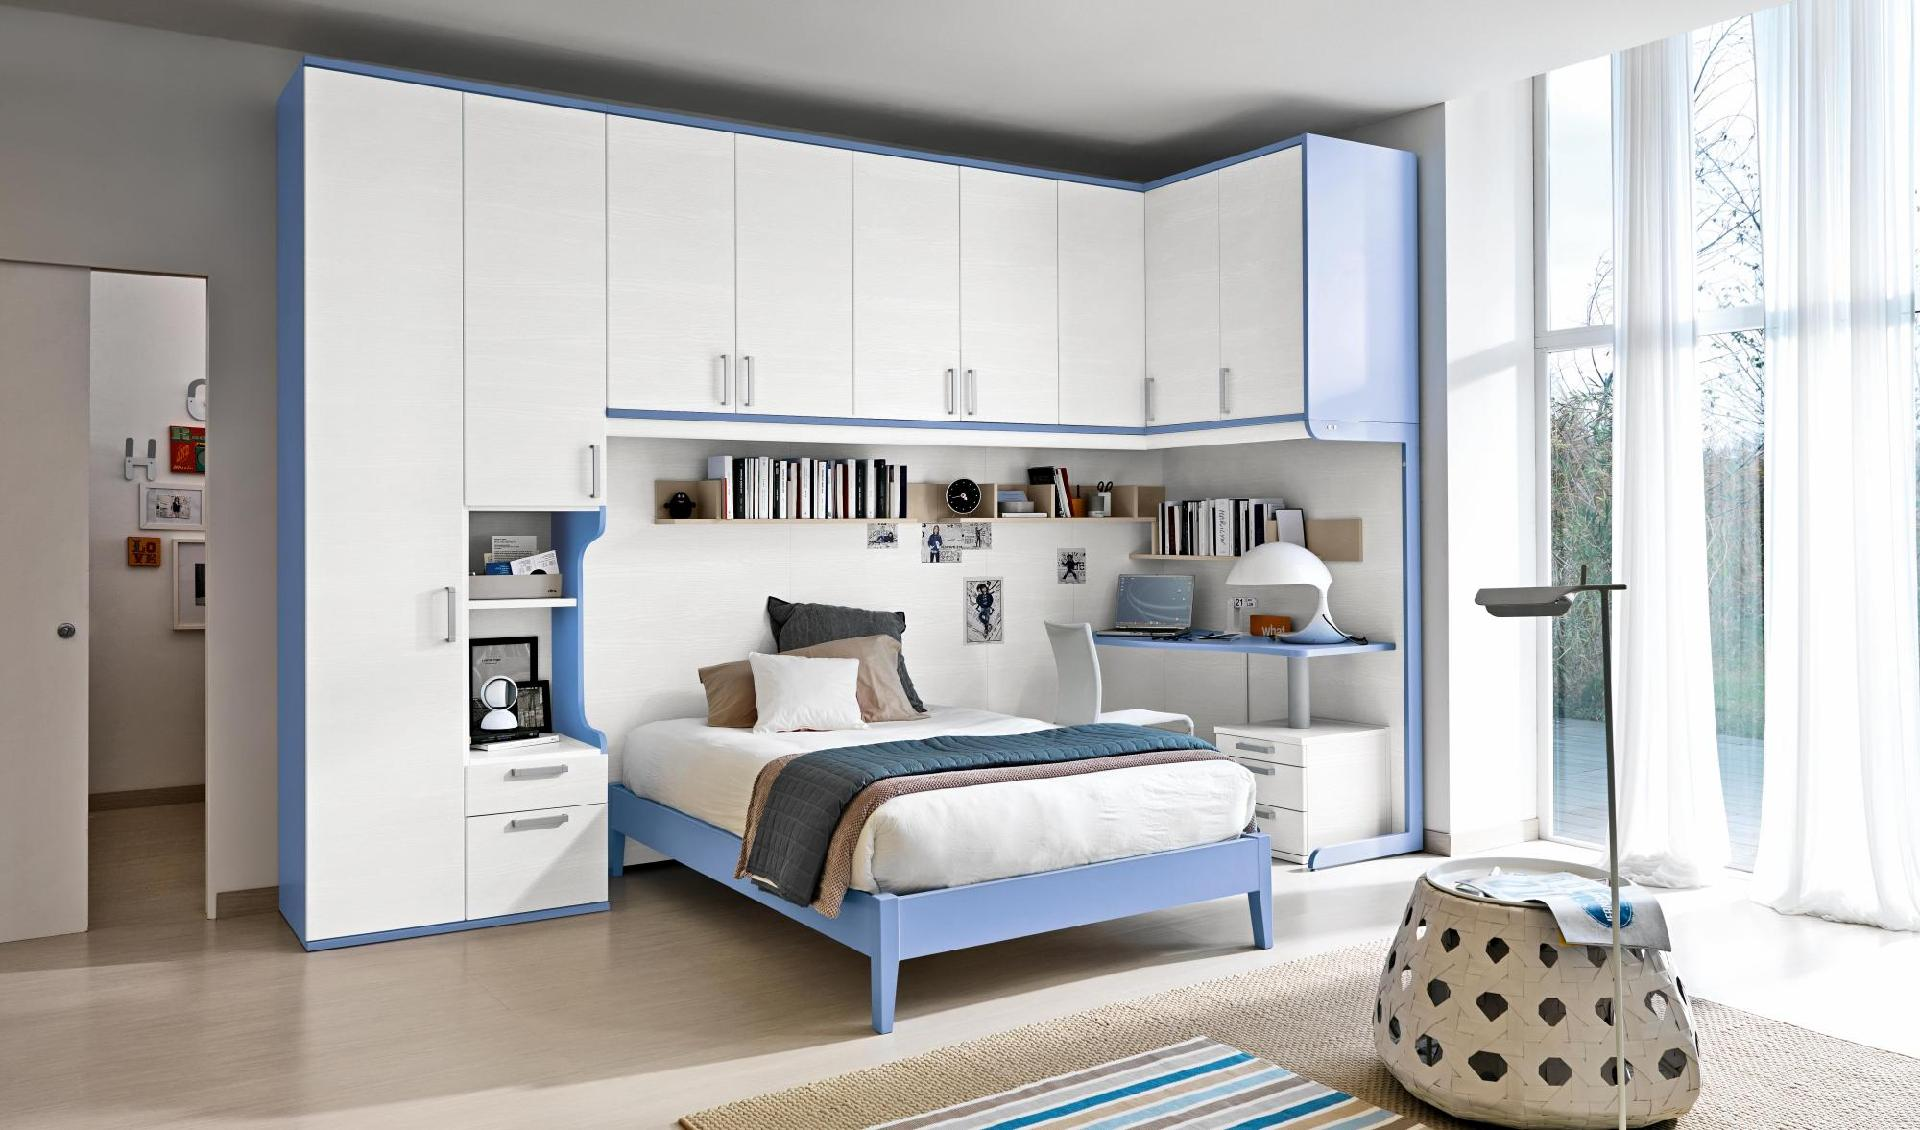 Best Colombini Camerette Prezzi Pictures - Home Design Ideas 2017 ...